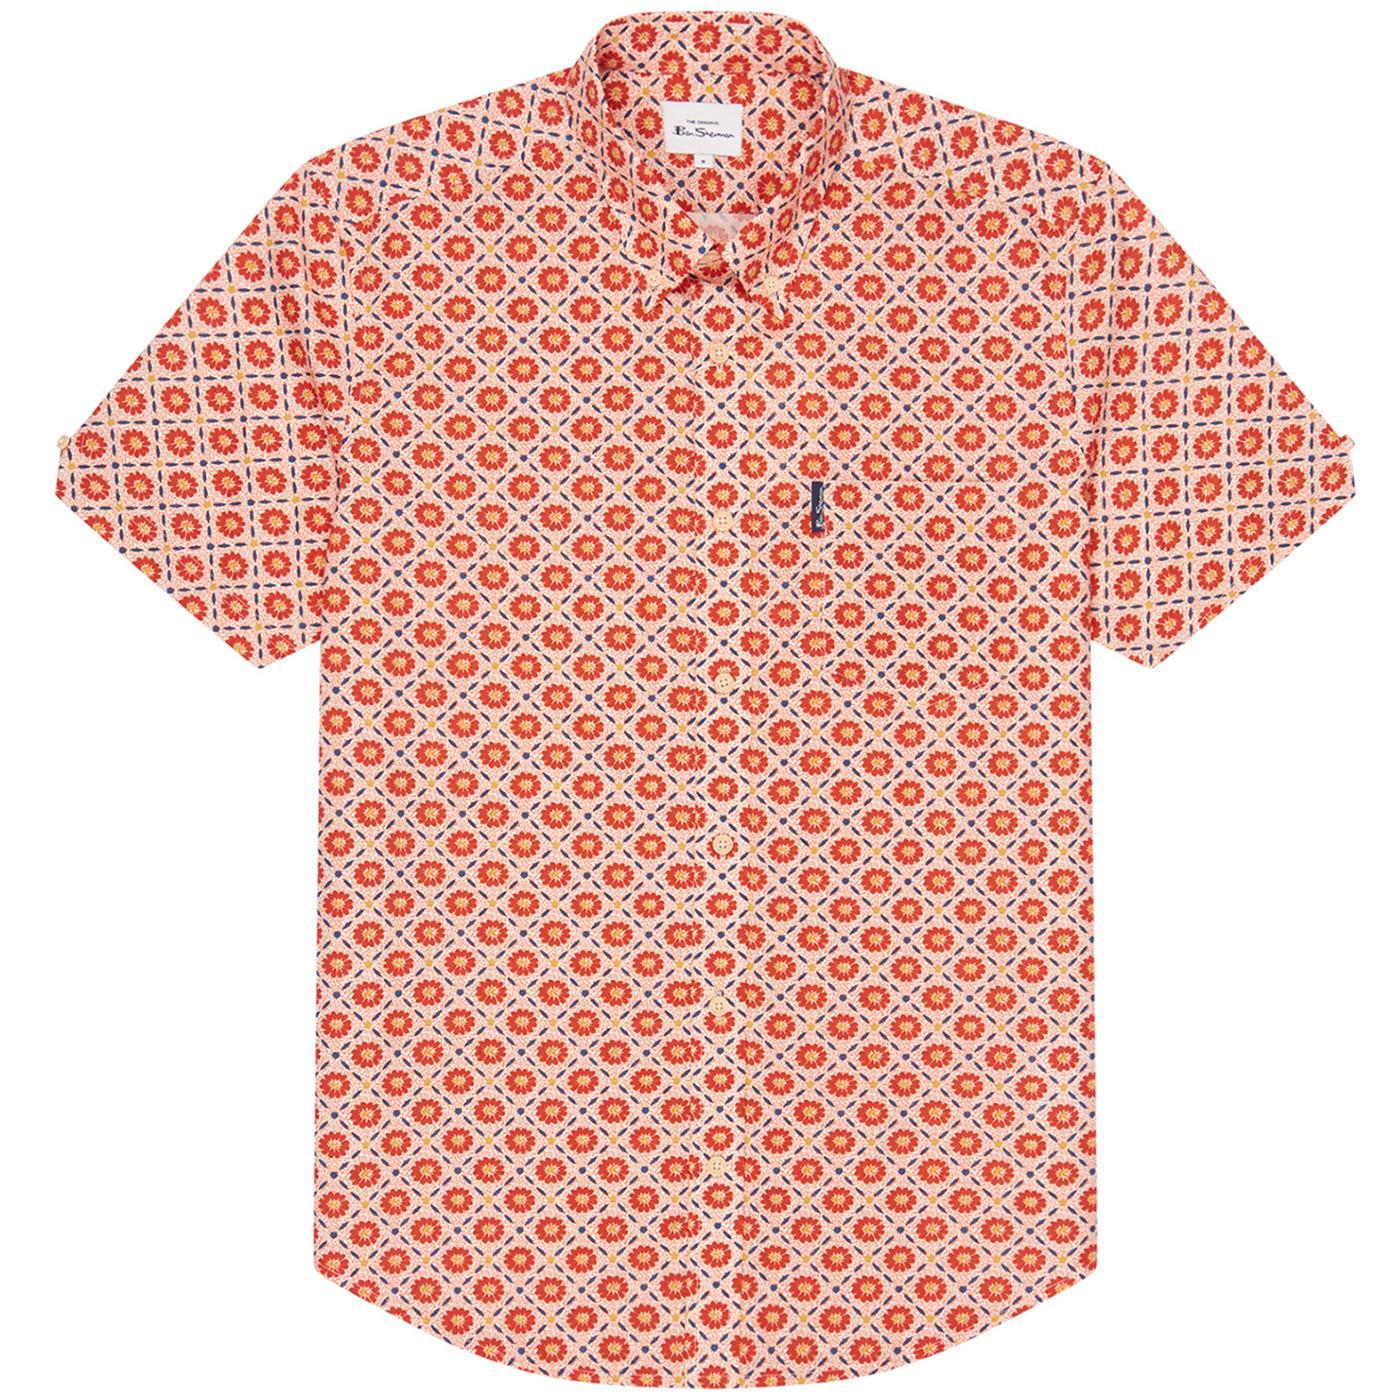 BEN SHERMAN 60s Mod Block Floral SS Shirt (MF)